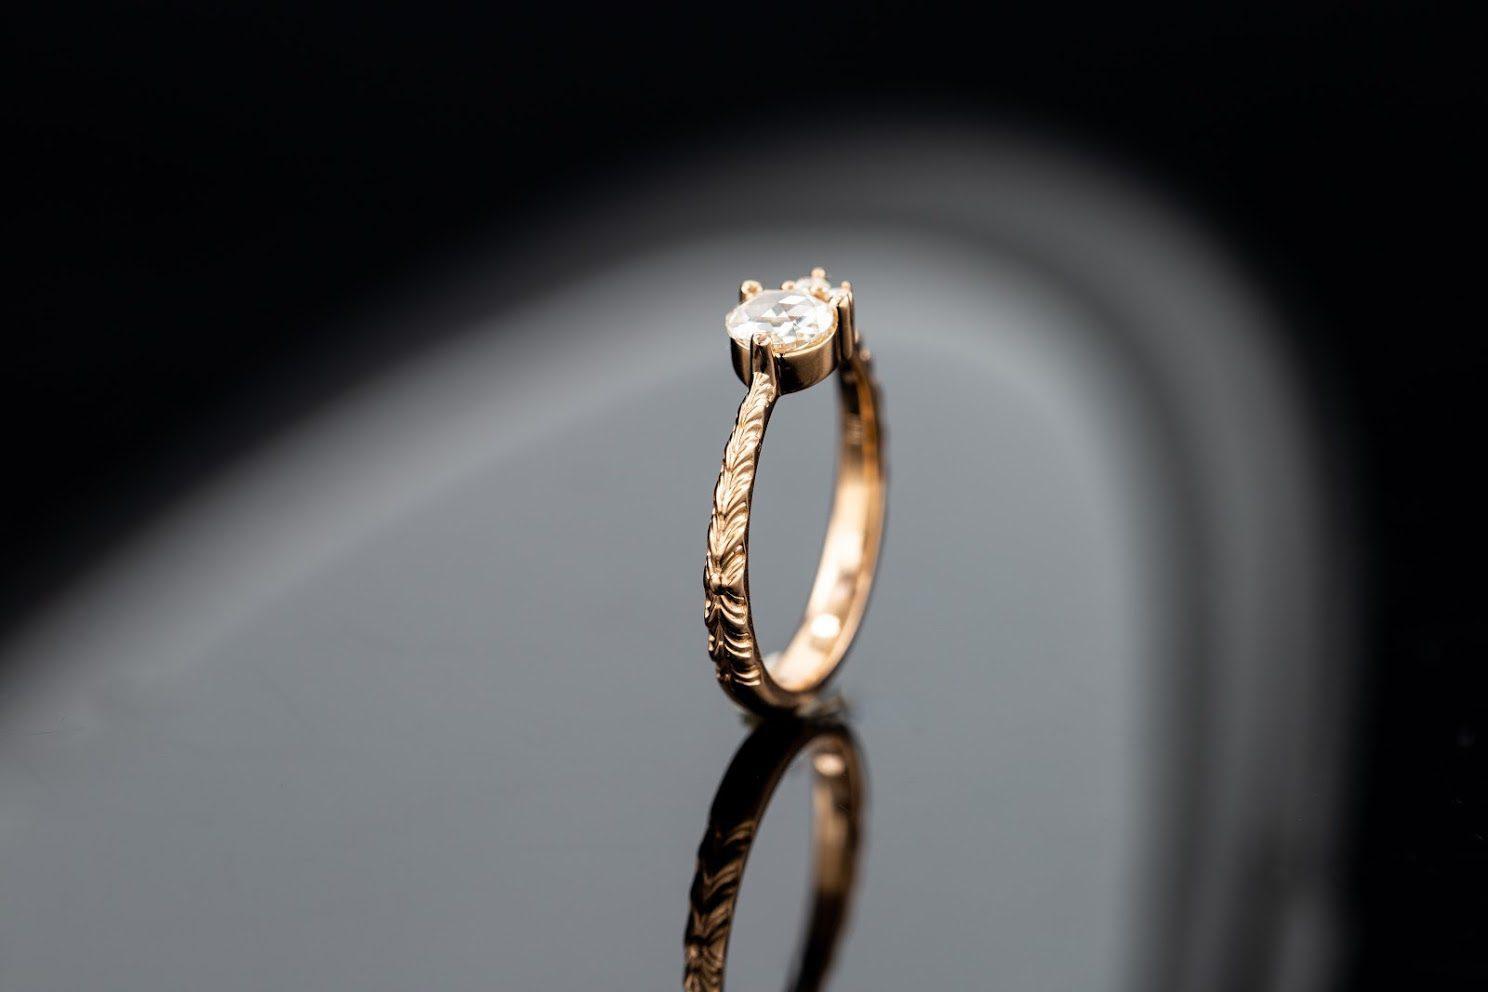 engraved band - engagement ring setting